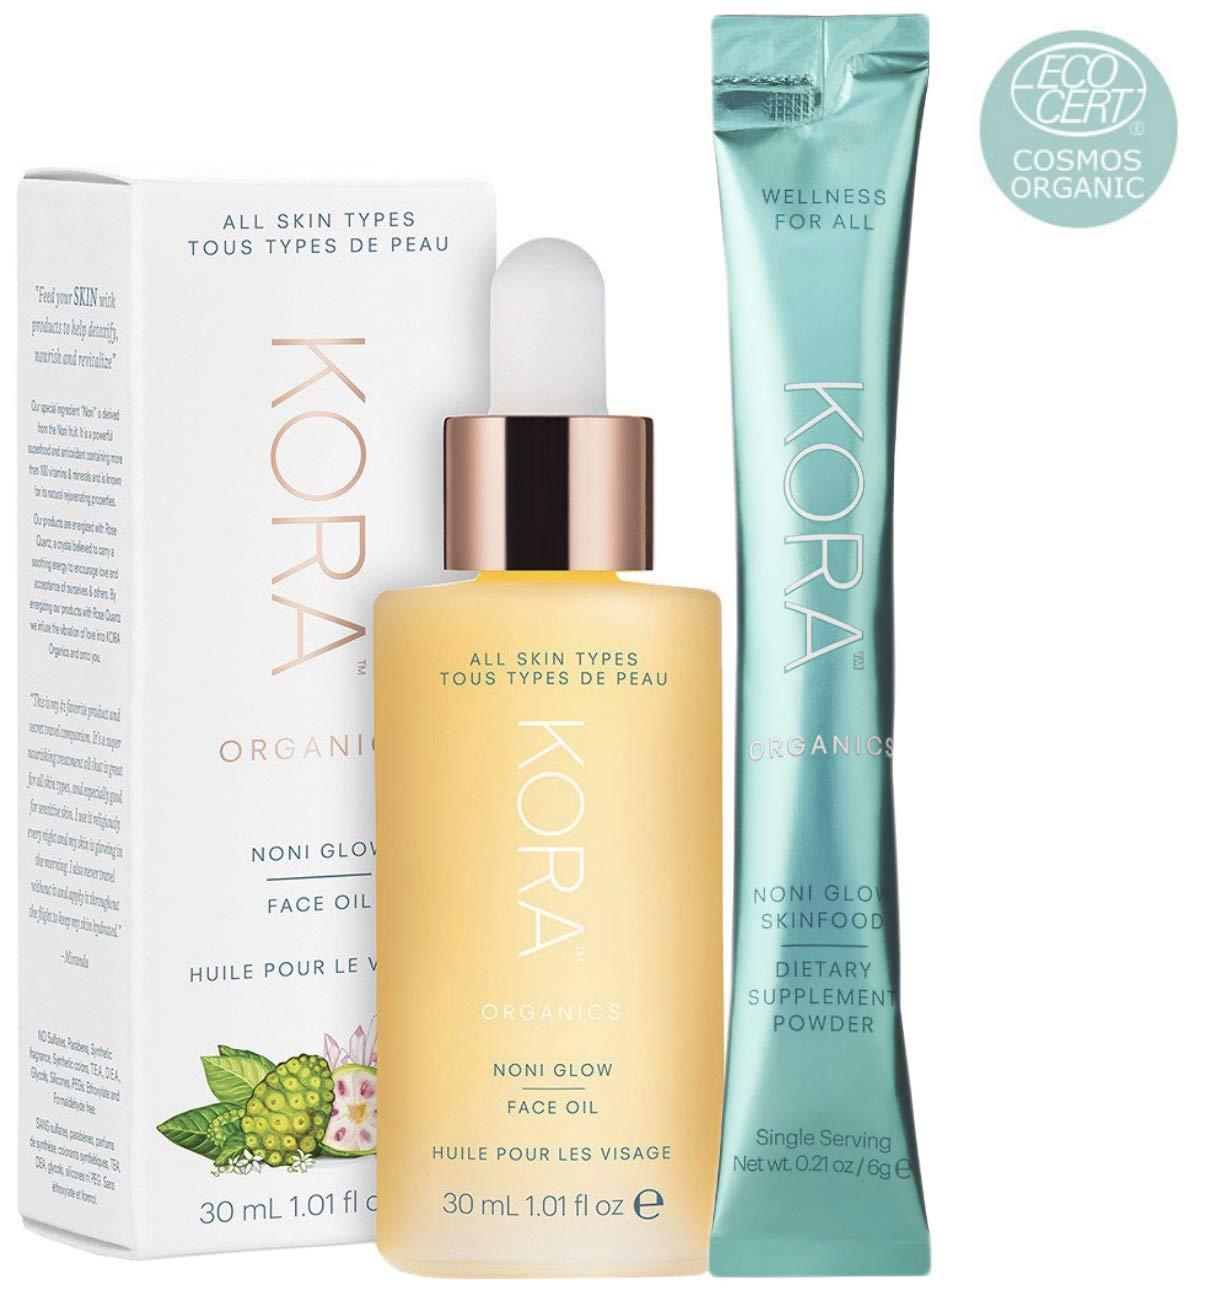 Kora Noni Glow Face Oil (Free Kora Skinfood Dietary Supplement Powder Packet)